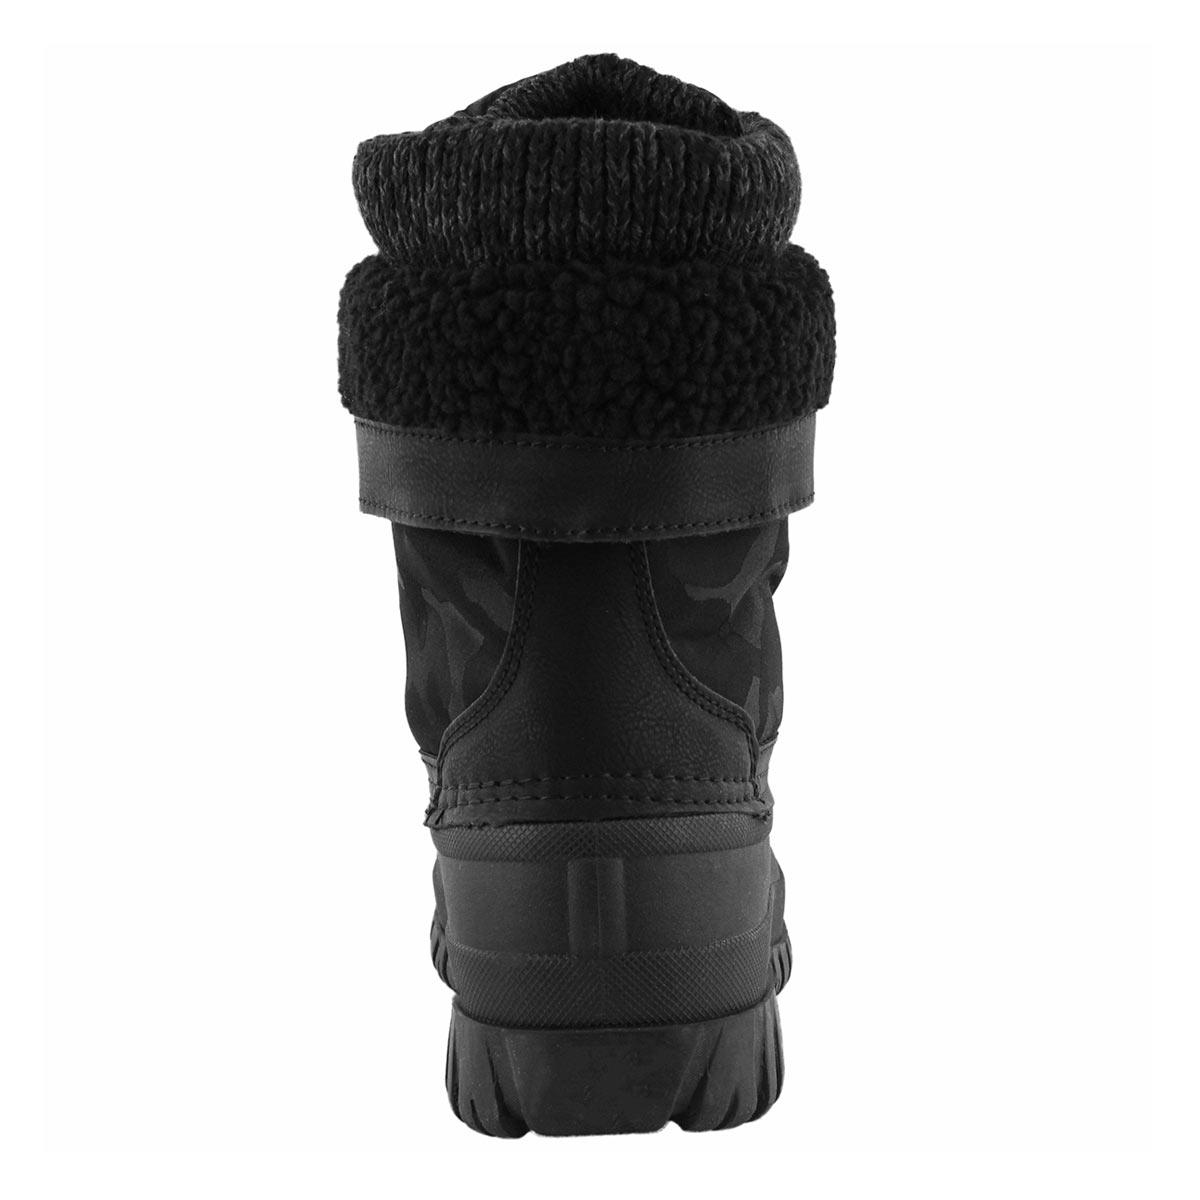 Lds Creek black camo wtpf winter boot